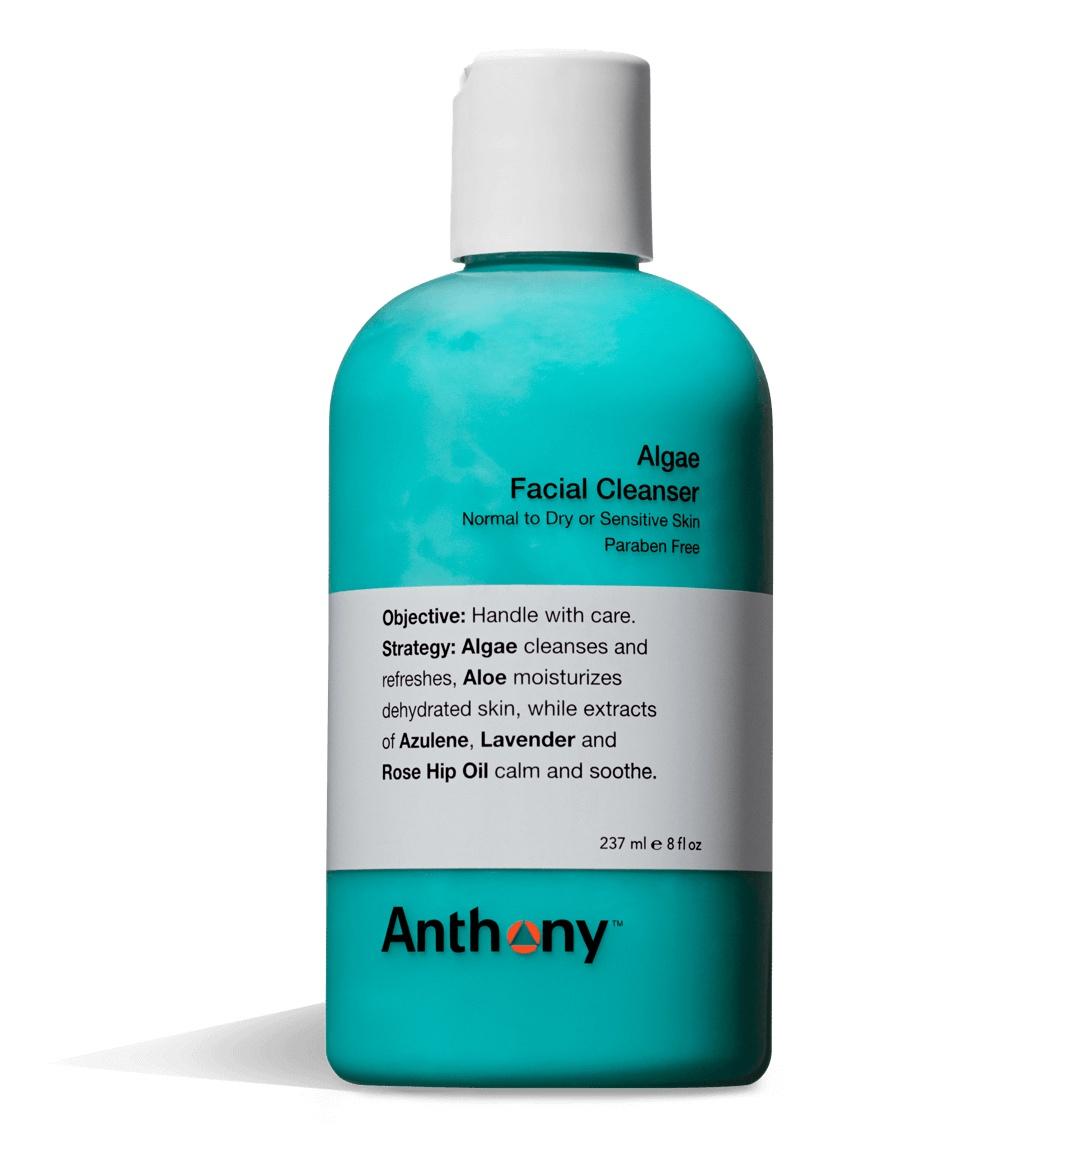 Anthony Algae Facial Cleanser